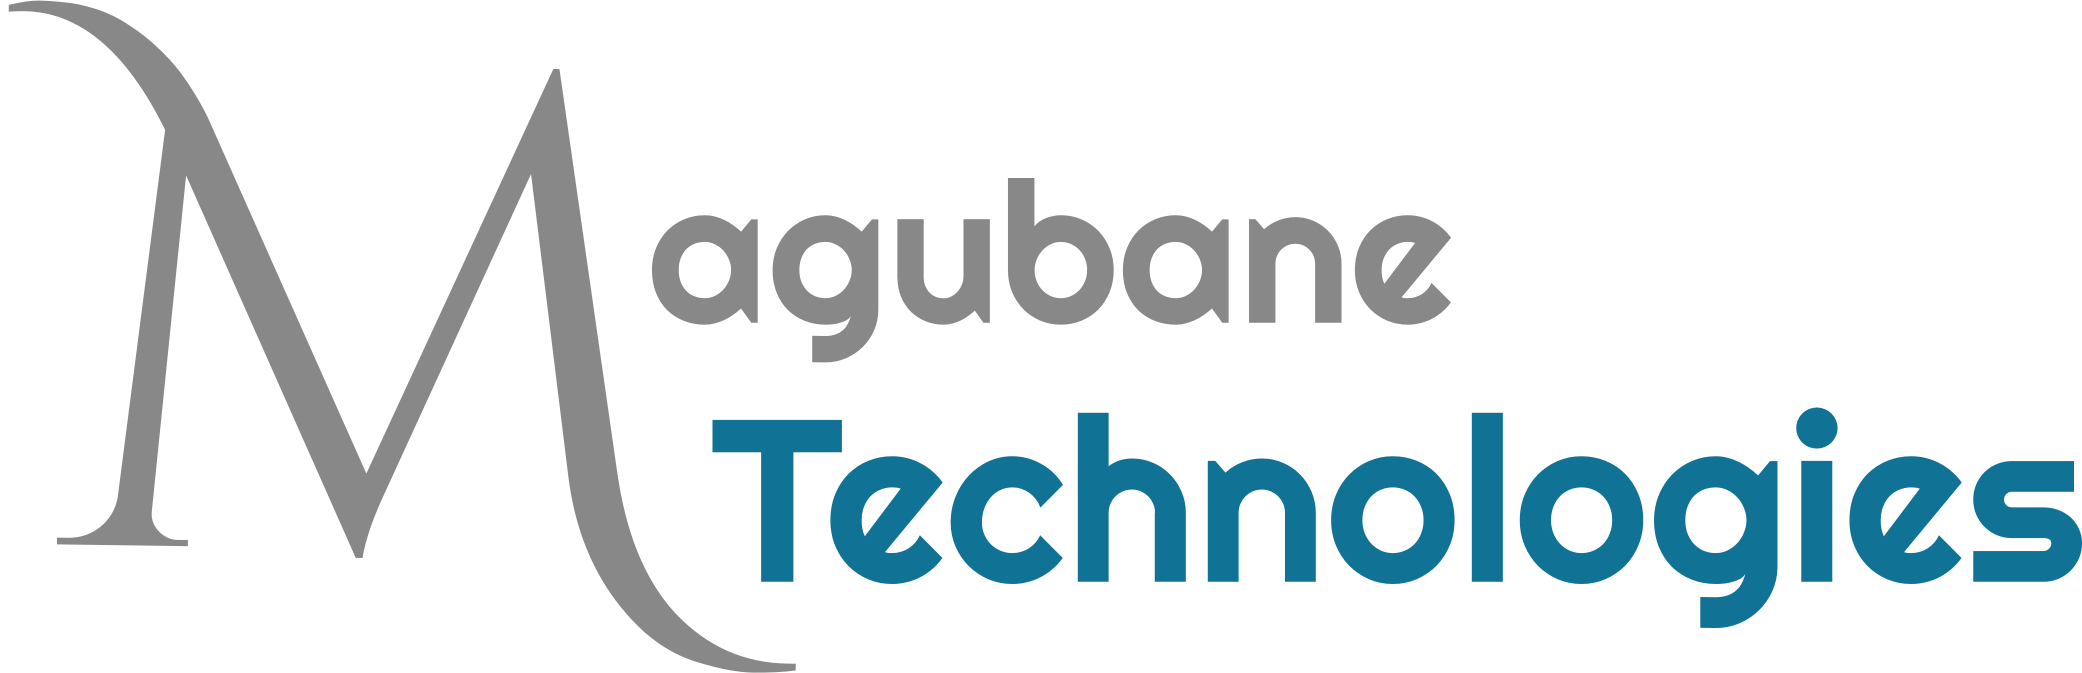 Magubane Technologies Logo